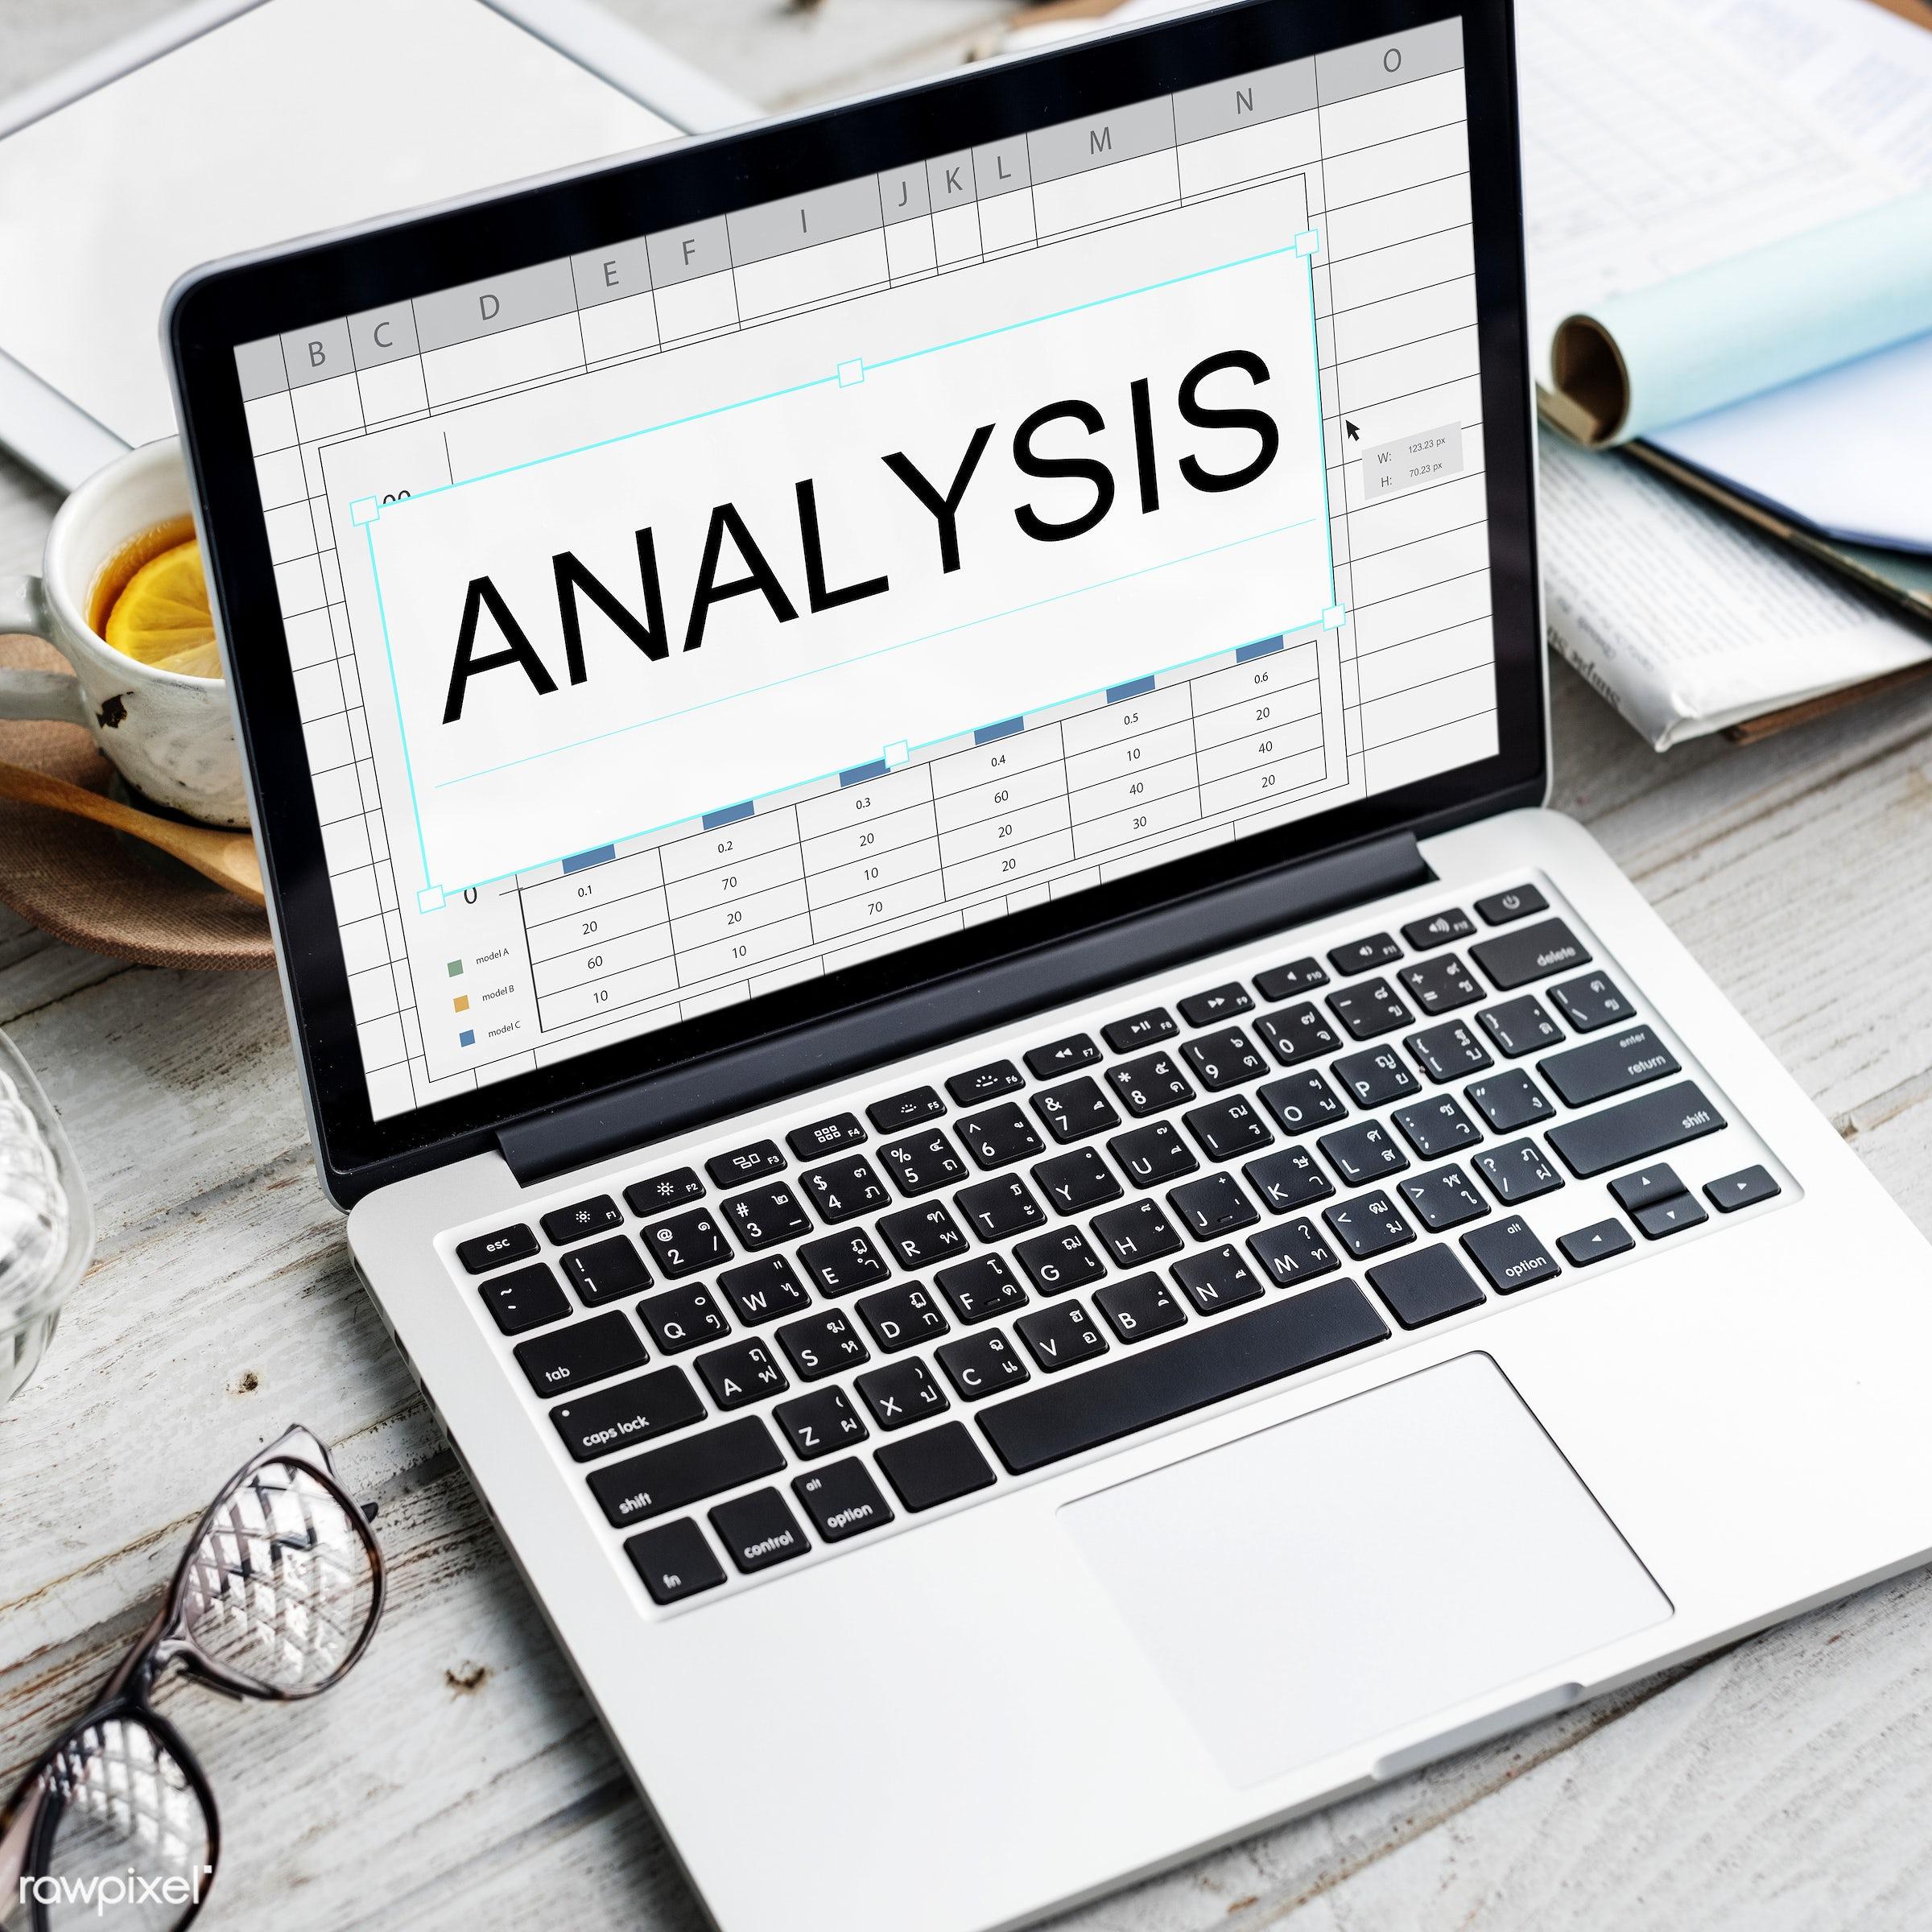 analysis, business, chart, communication, computer, connection, data, data analysis, data management, development, device,...